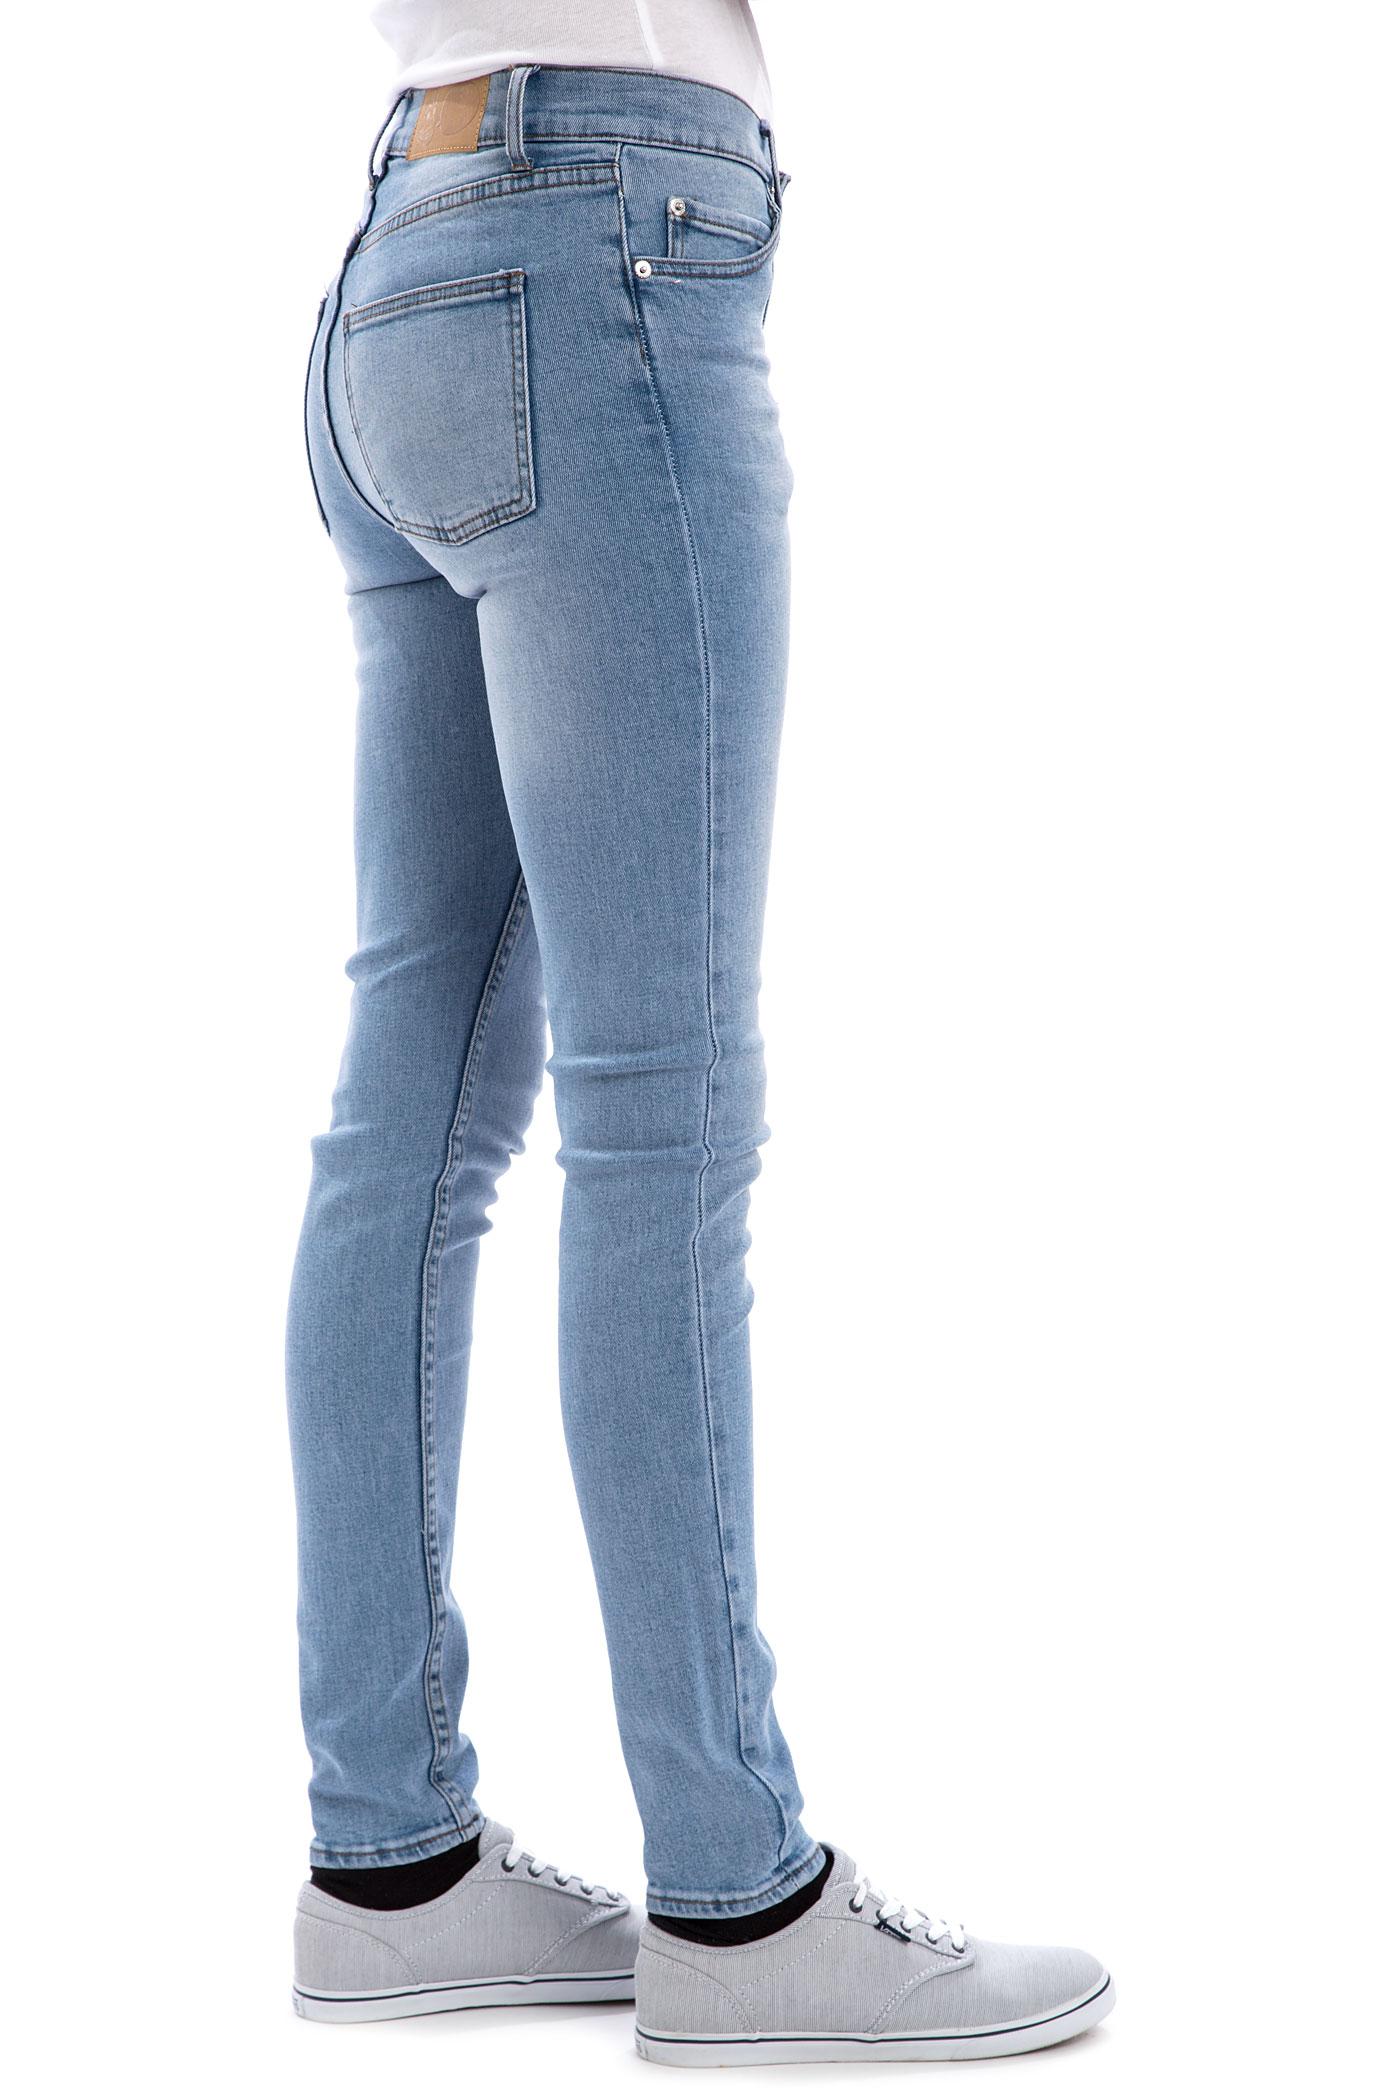 Slimming Faux Jeans Leggings